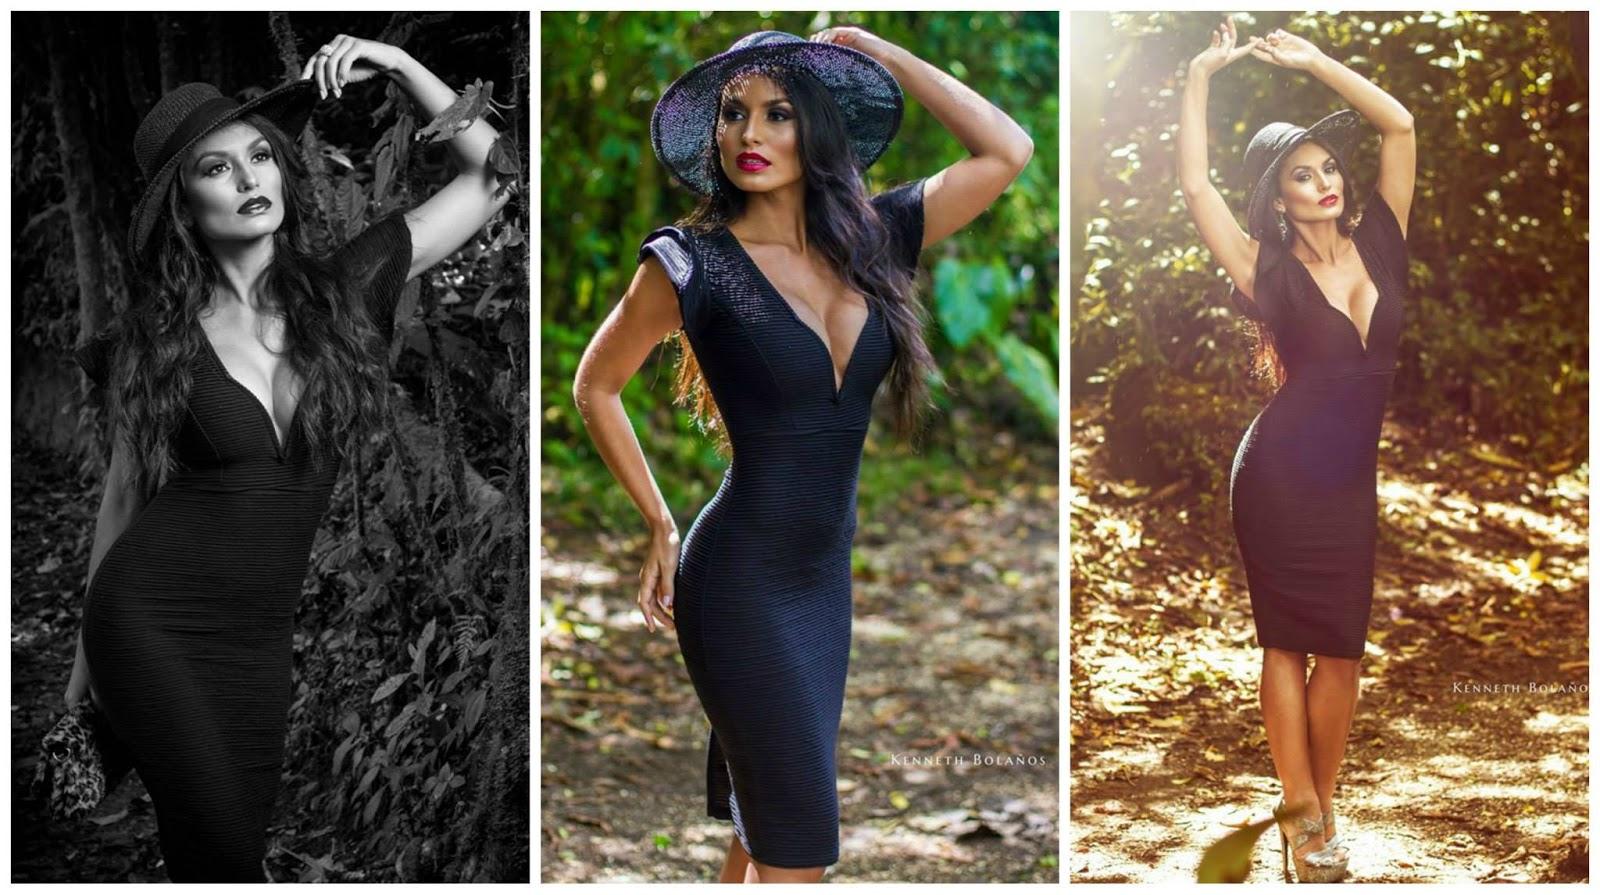 Sexy Costa Rican Women